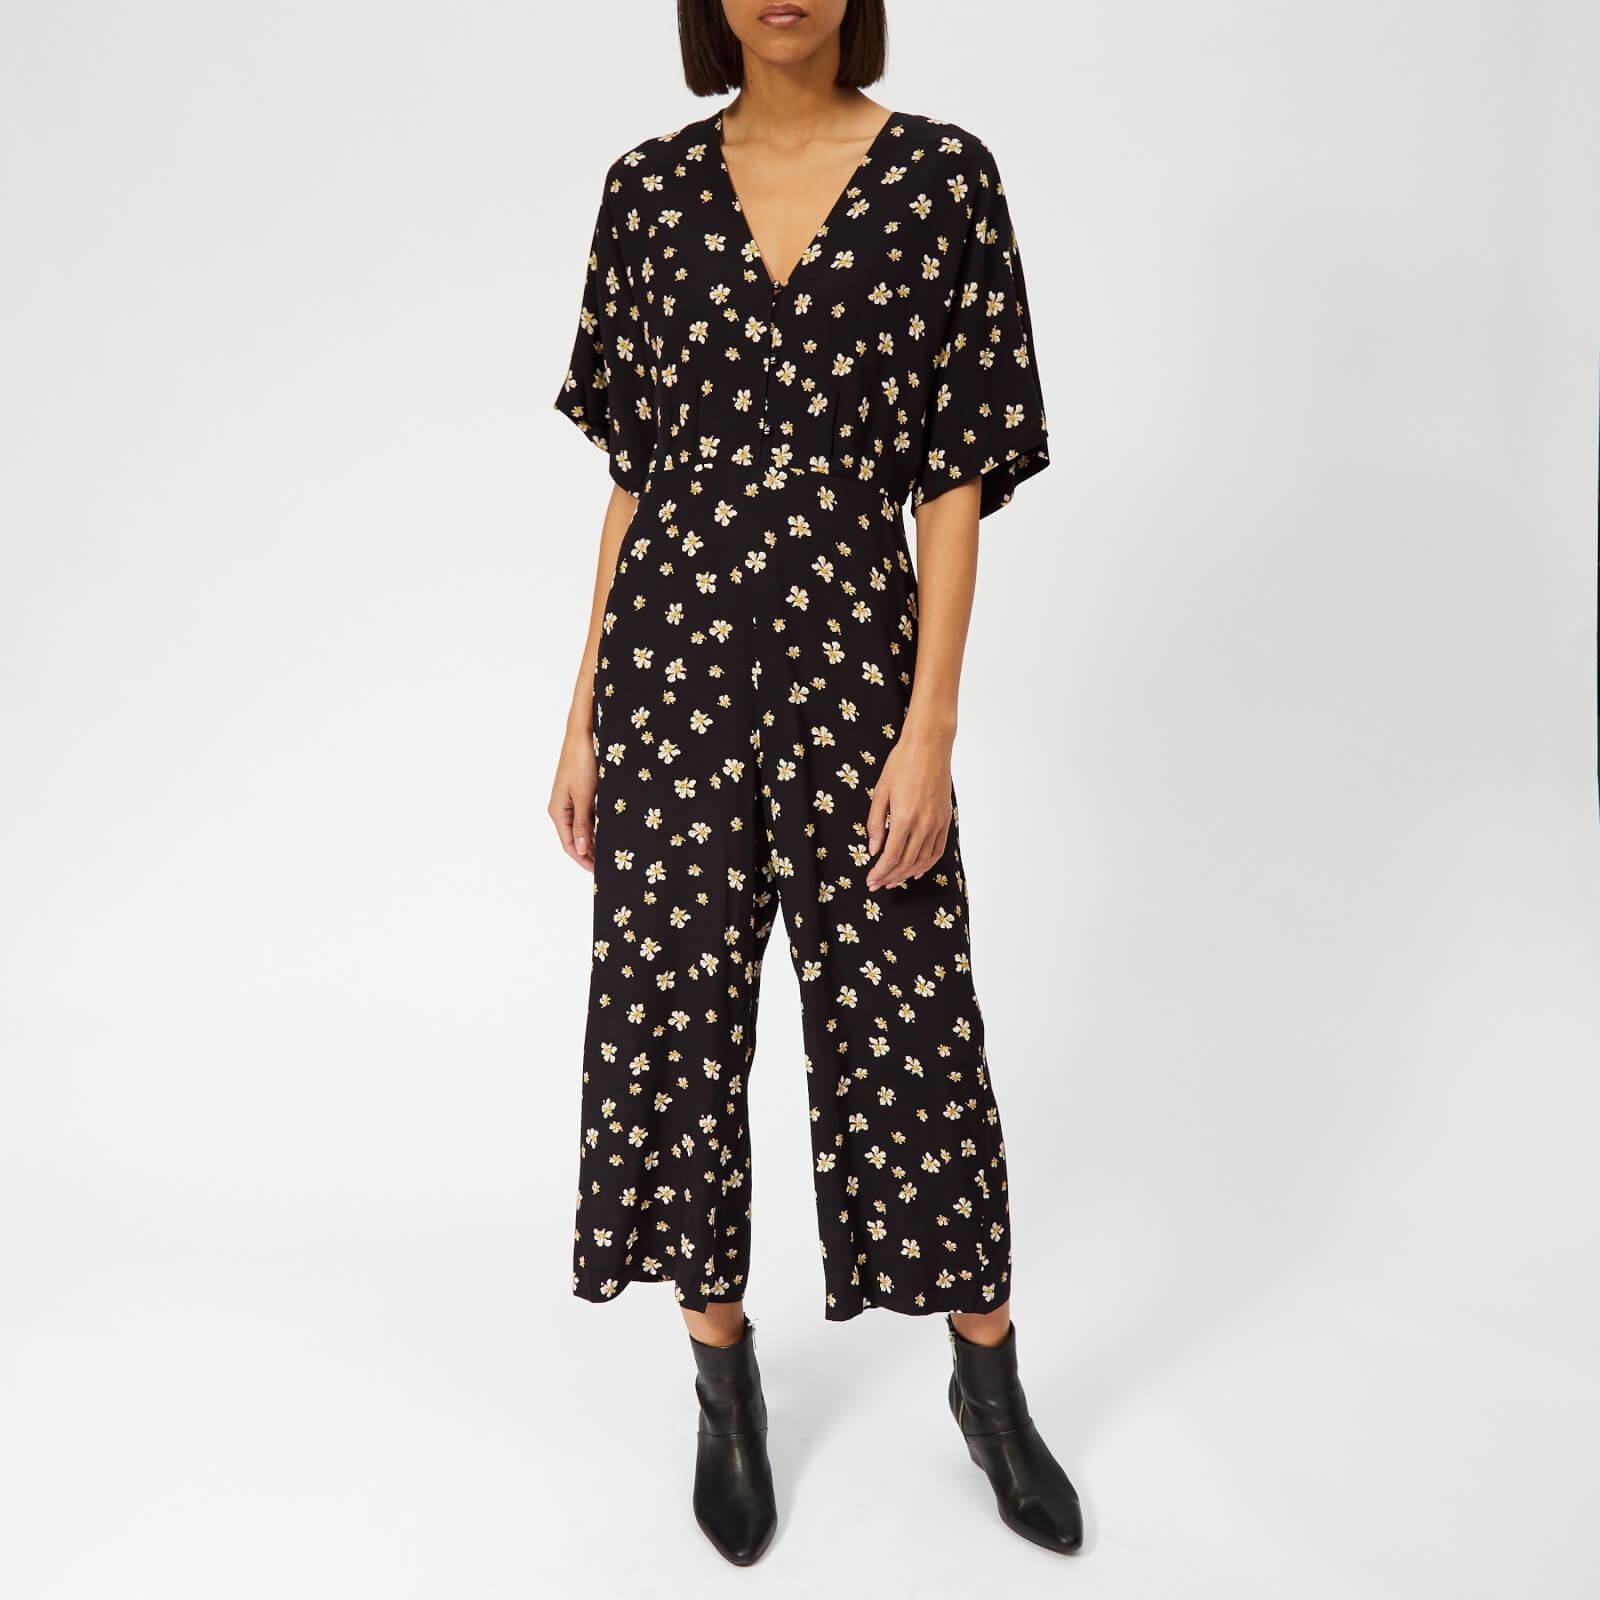 Whistles Women's Edelweiss Print Button Jumpsuit - Black/Multi - UK 8 - Black